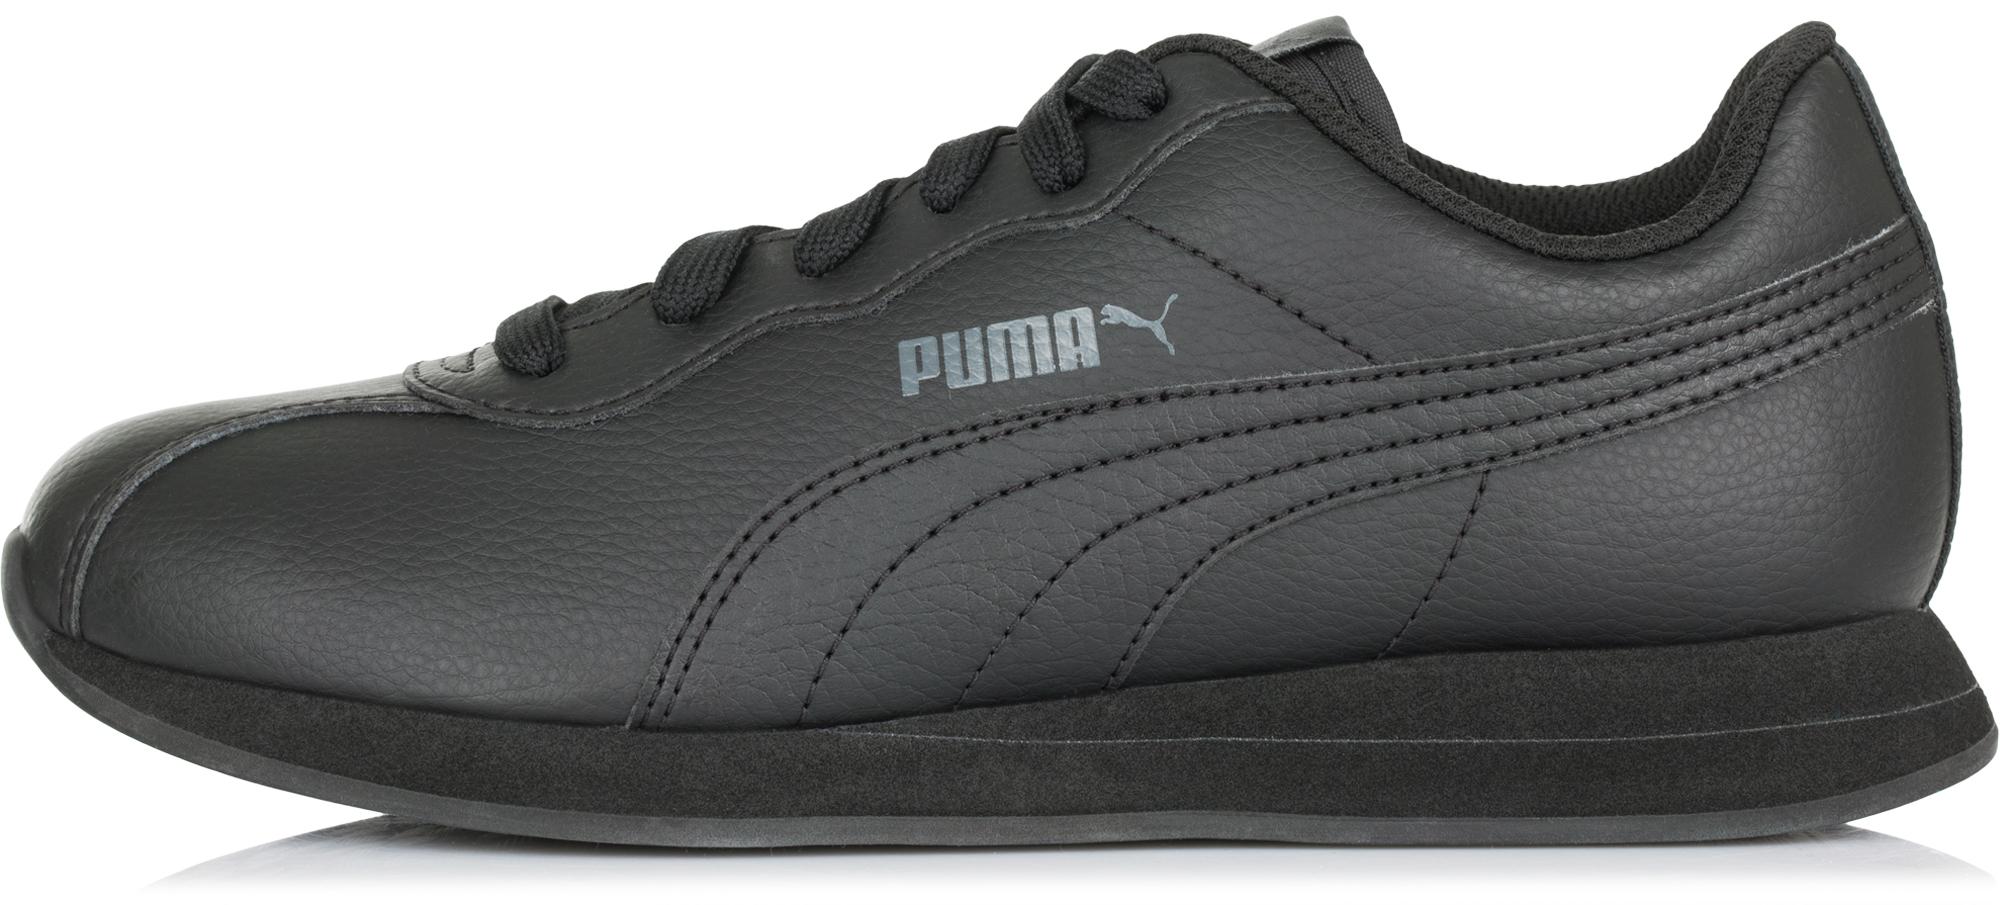 Puma Кроссовки детские Puma Turin II, размер 36,5